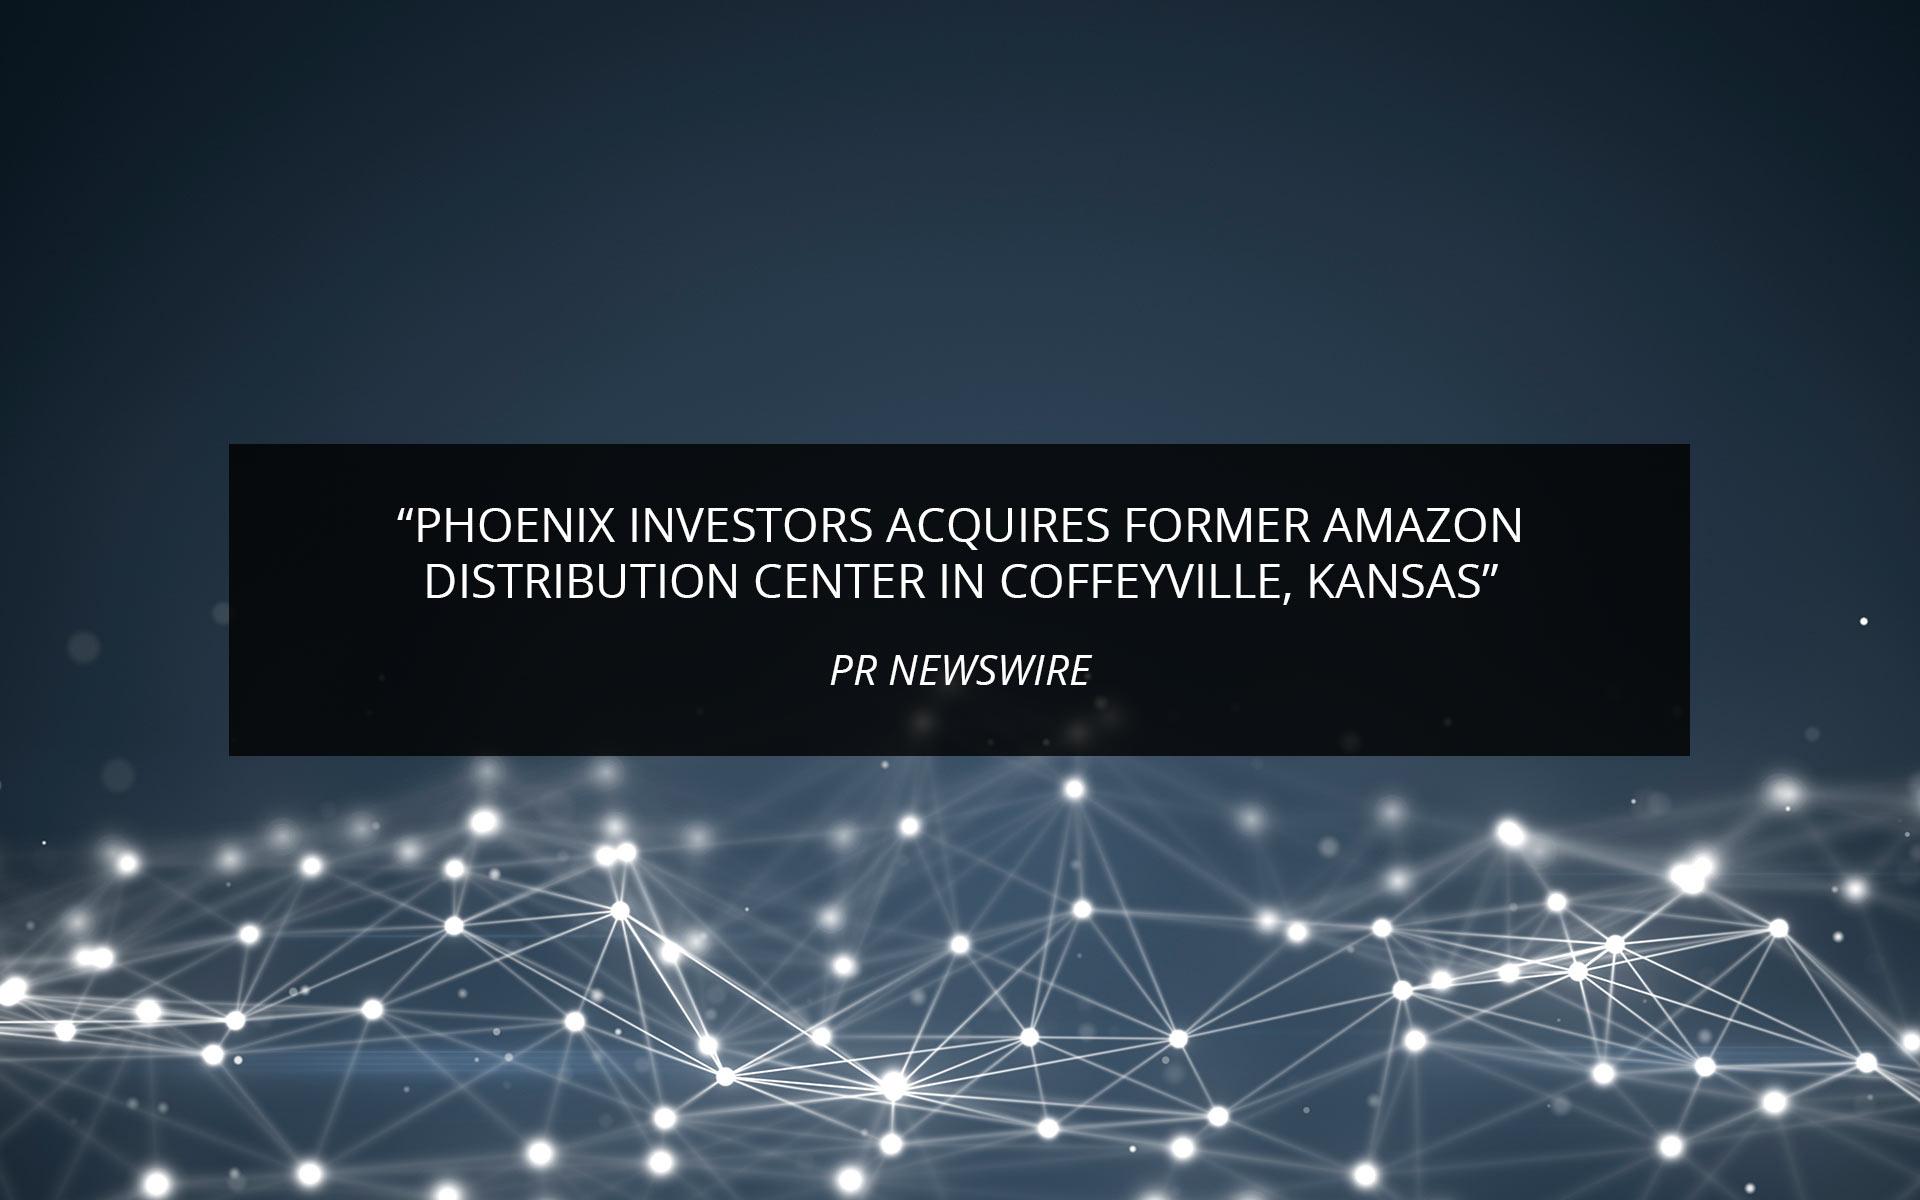 Coffeyville Press Release | Phoenix Investors